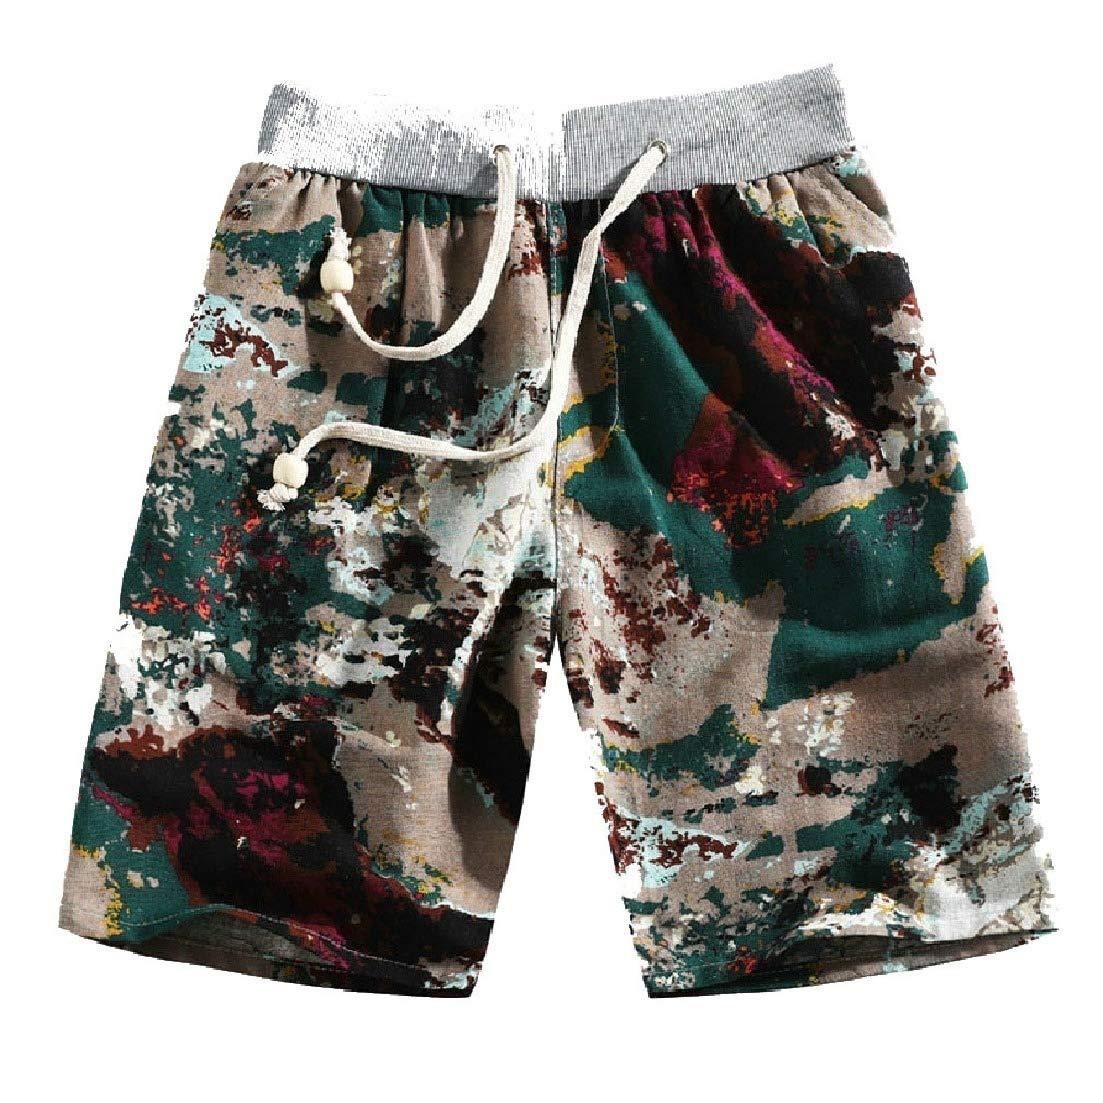 Zimaes-Men Casual Holiday Slim Fit Linen Summer Swim Trunks Board Shorts?